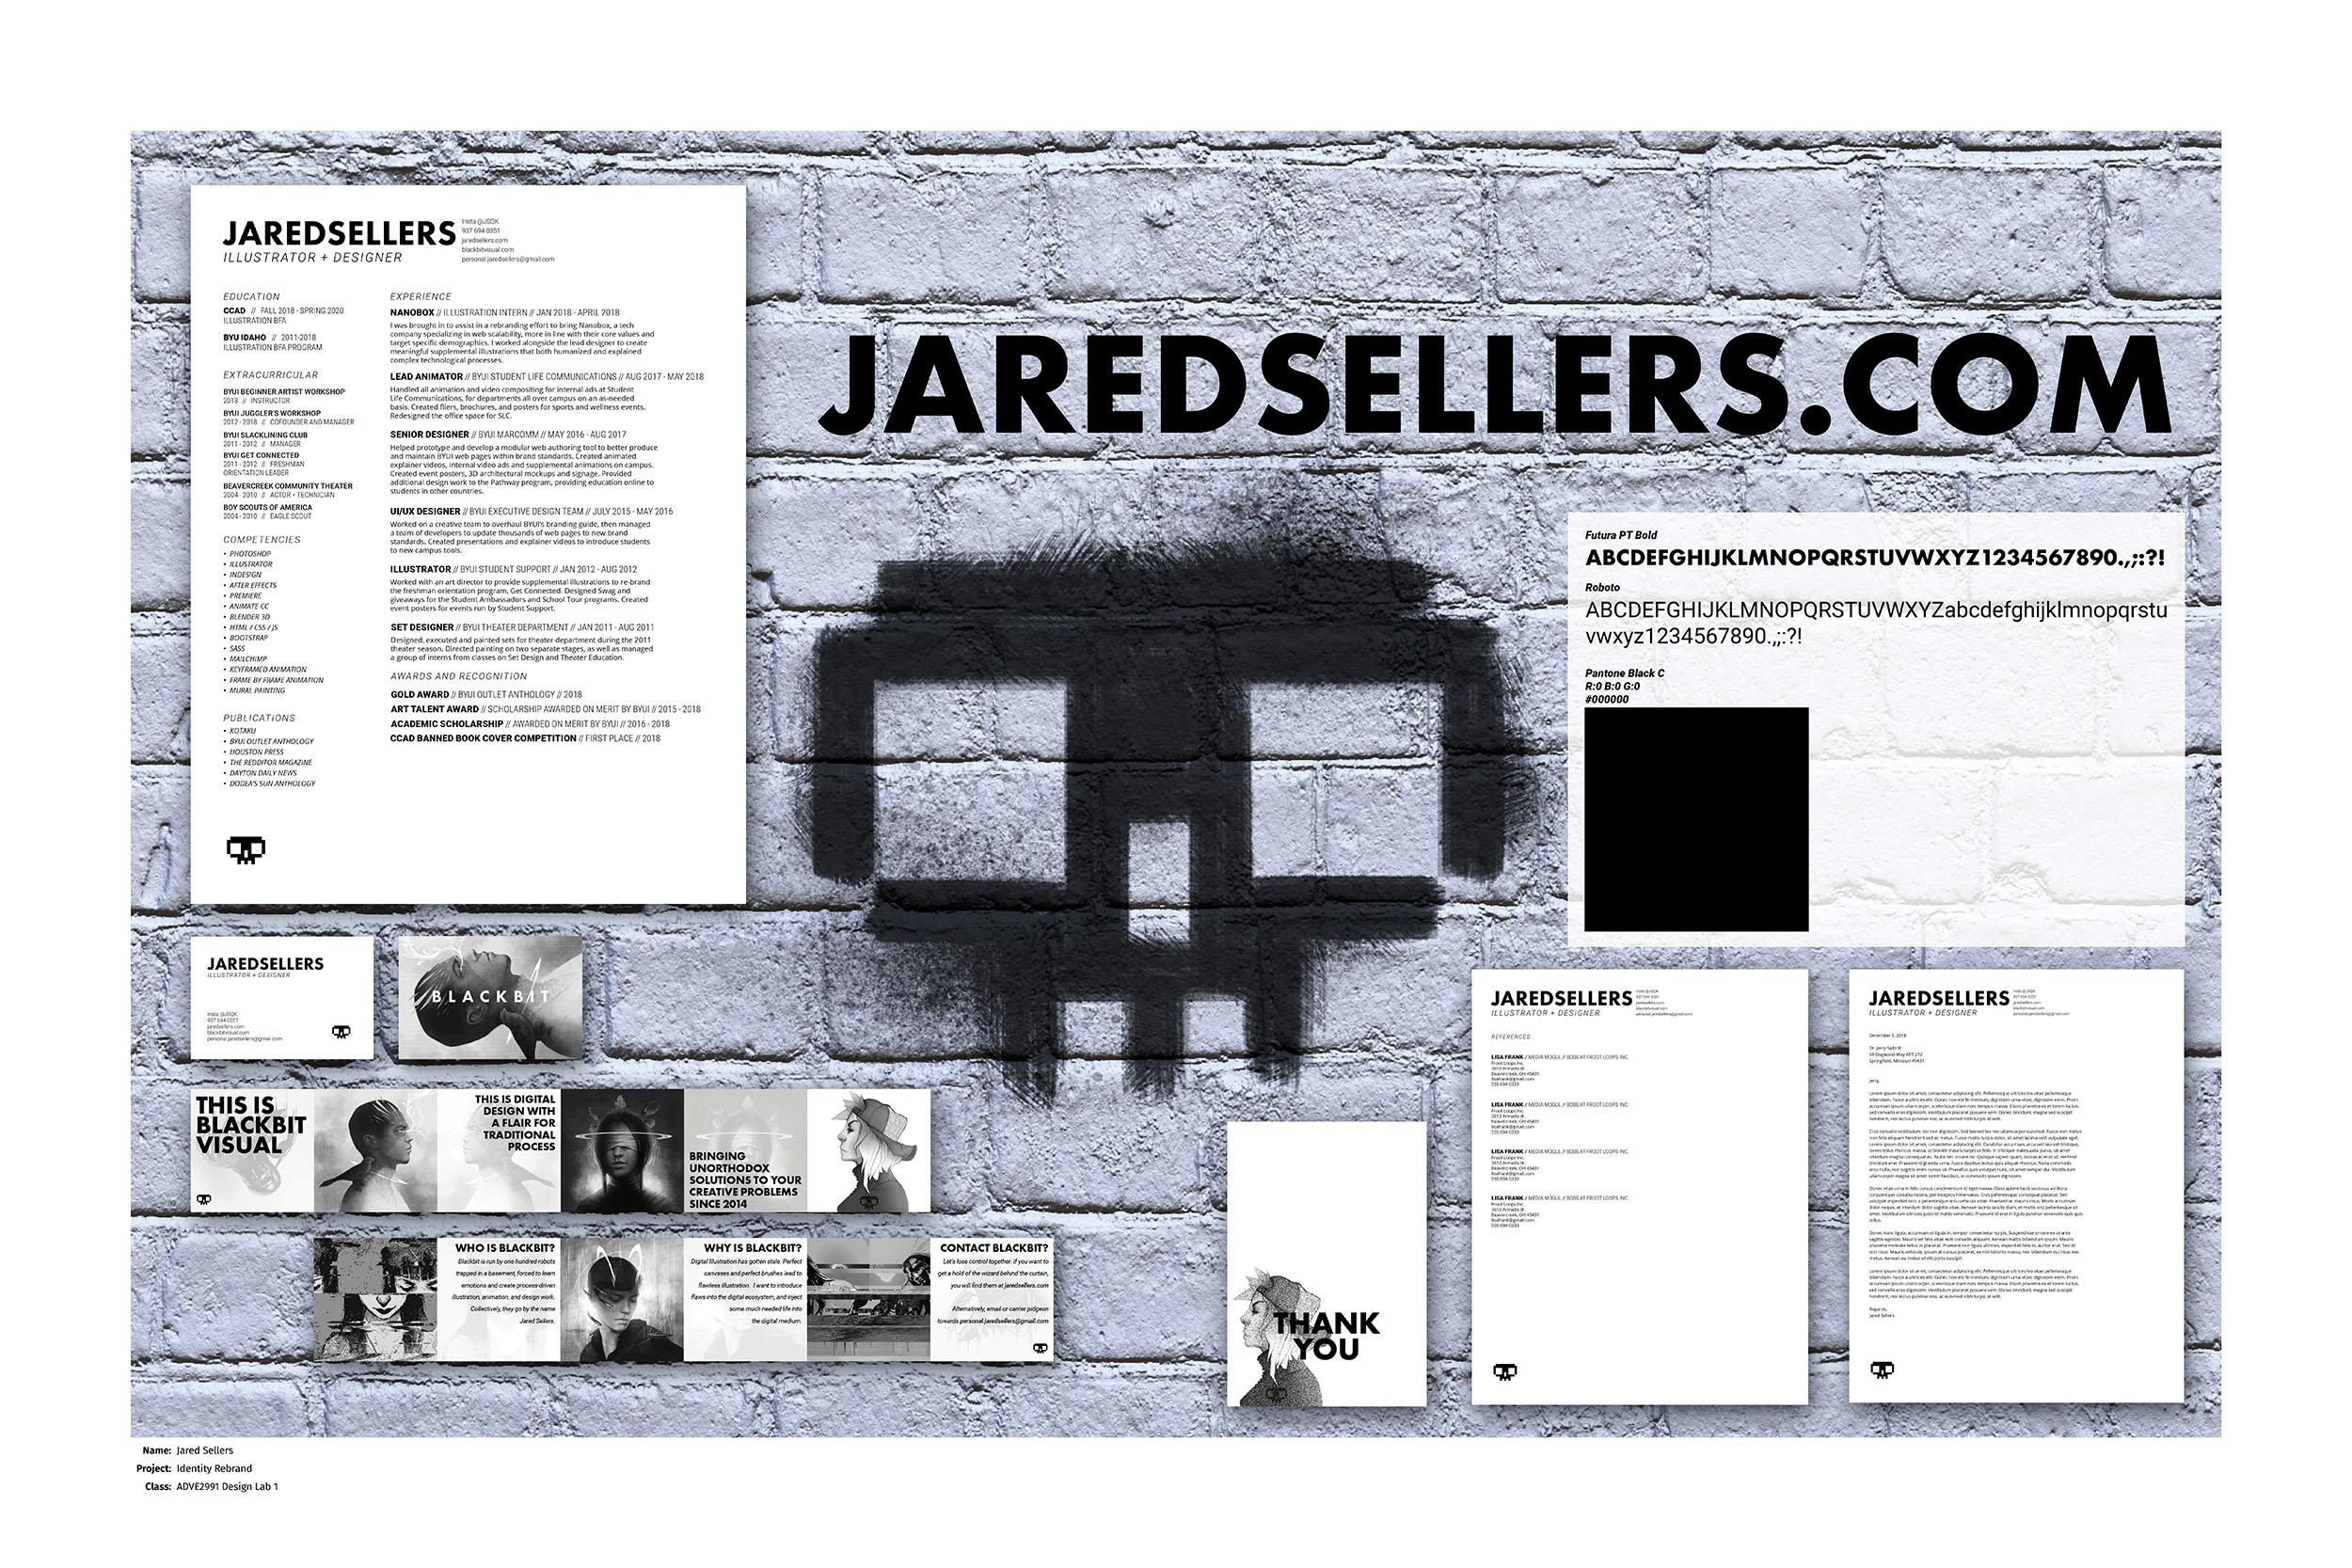 ADVE2291-DBennett-Proj5 PBoard-JaredSellers-v2.jpg